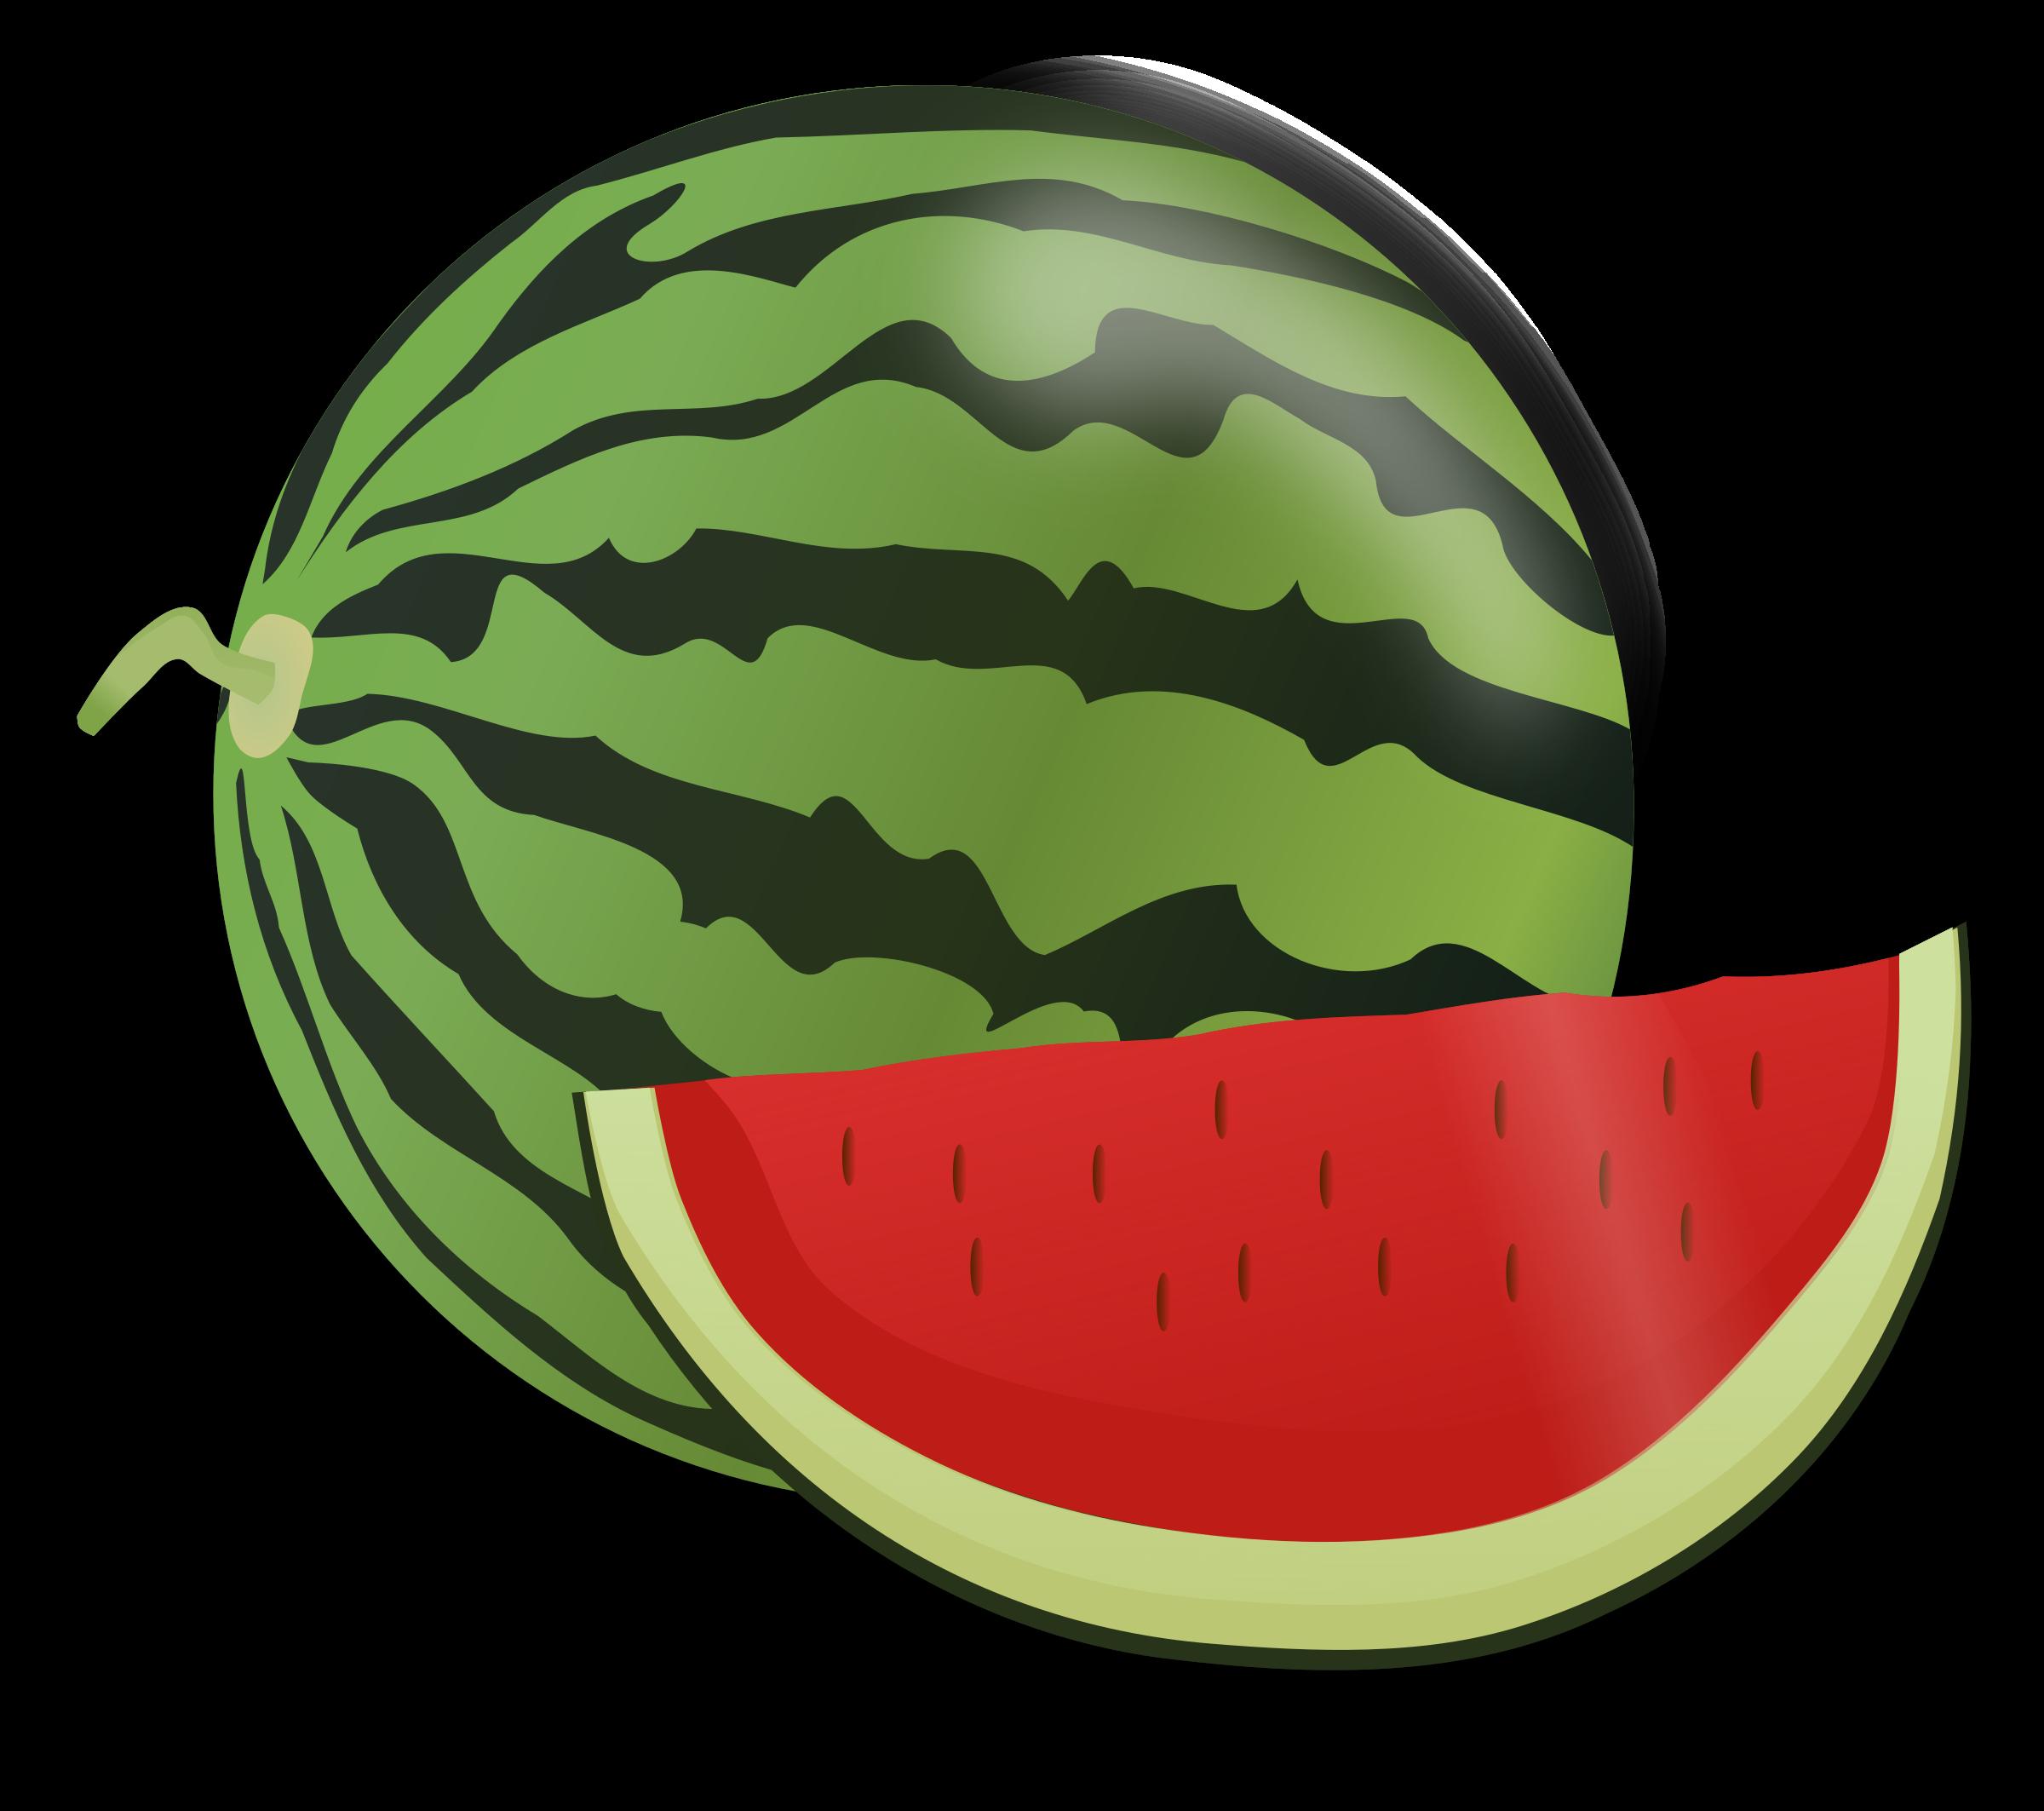 Plants clipart water melon. Big image png